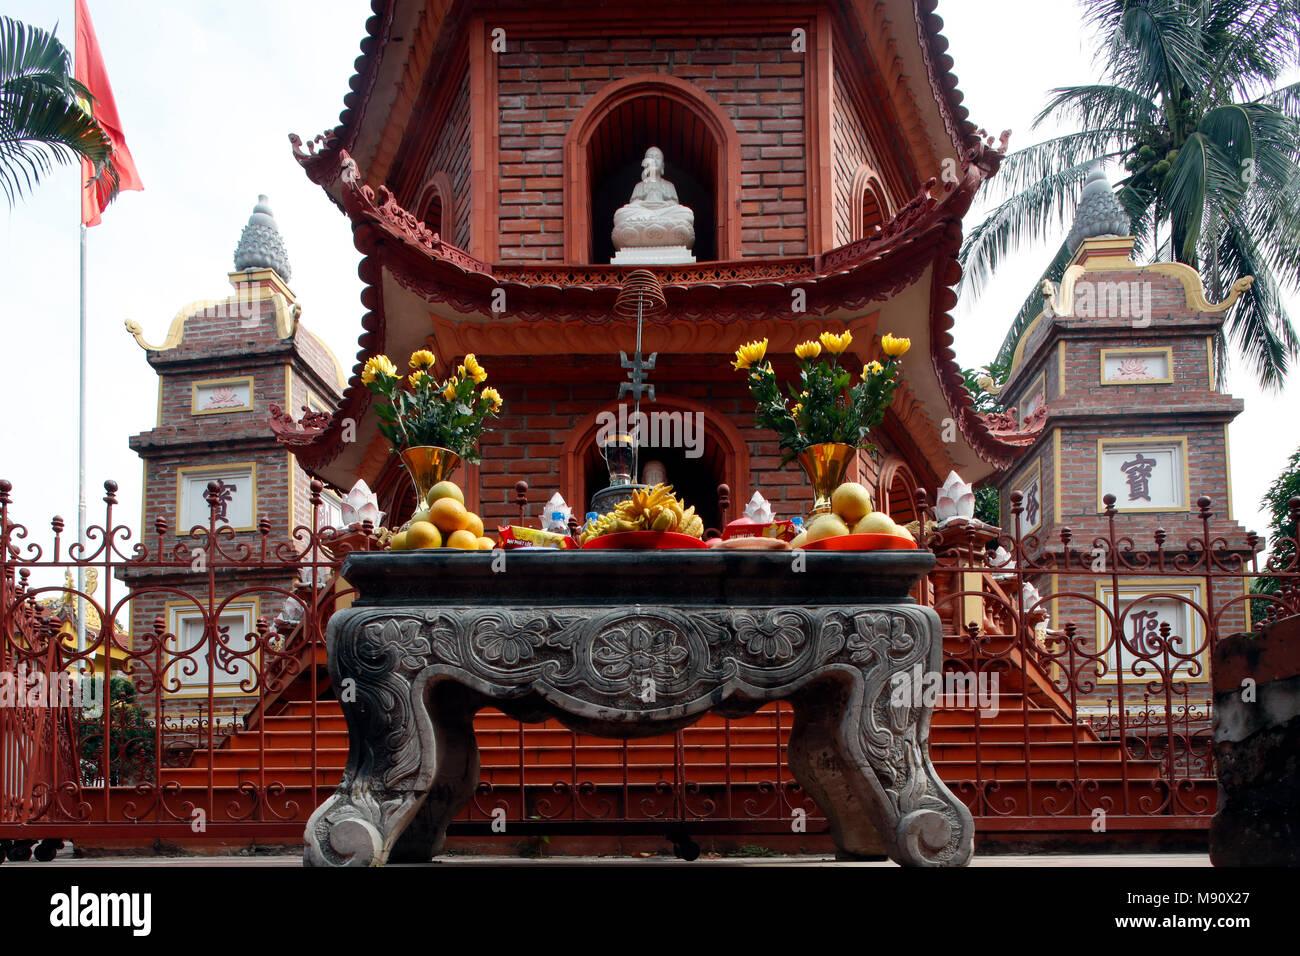 Tran Quoc Pagoda (Chua Tran Quoc), Hanoi. Vietnam. Stock Photo